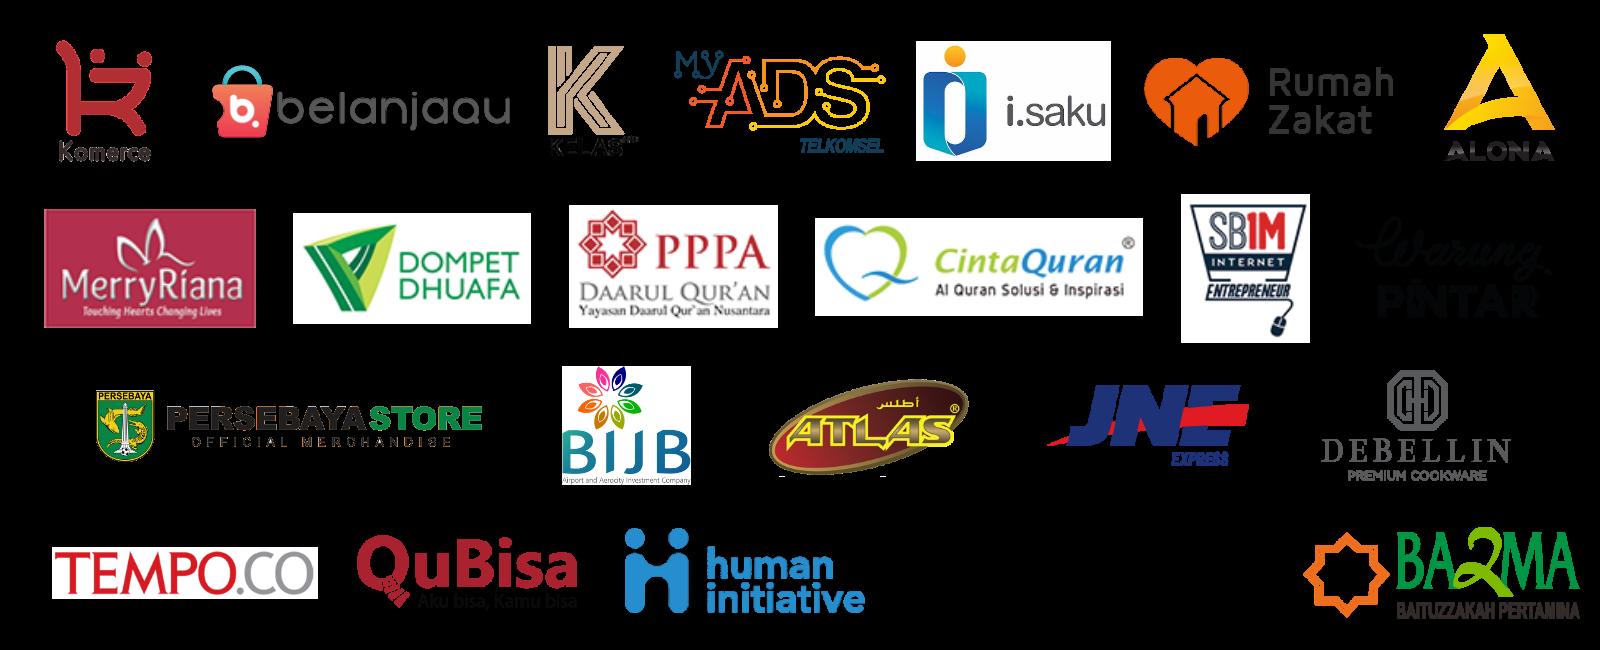 Homepage - Layanan Email Marketing, Autoresponder, dan Marketing Automation Terbaik Indonesia - KIRIM.EMAIL - 9